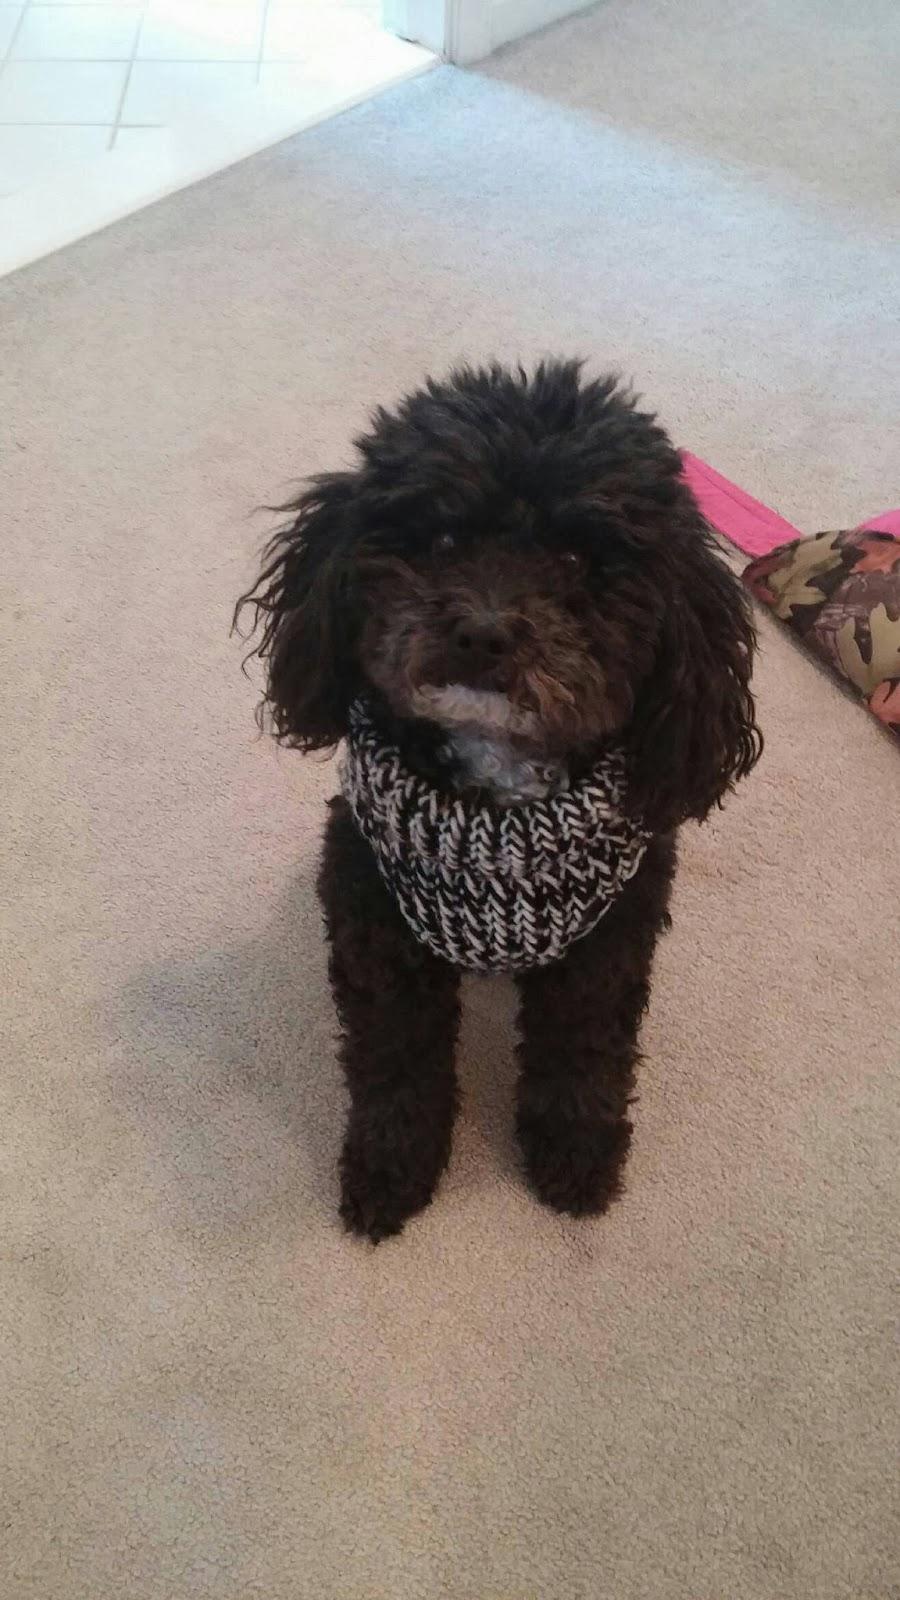 Knitting A Dog Sweater : Corky crafts knit hats loom knitting a dog sweater